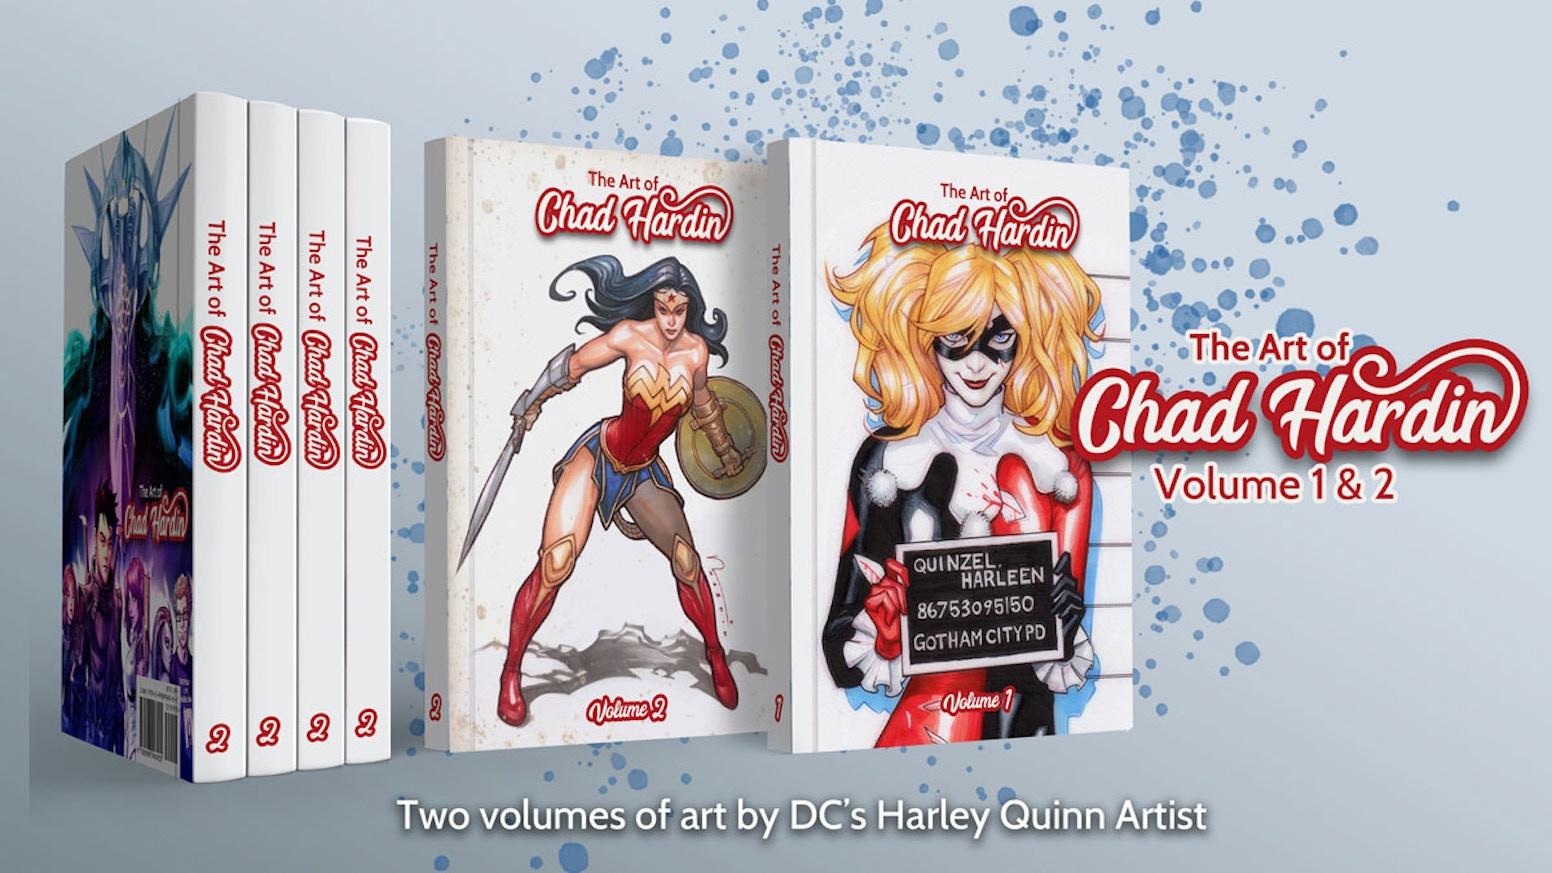 The Art of Chad Hardin Volumes 1 & 2